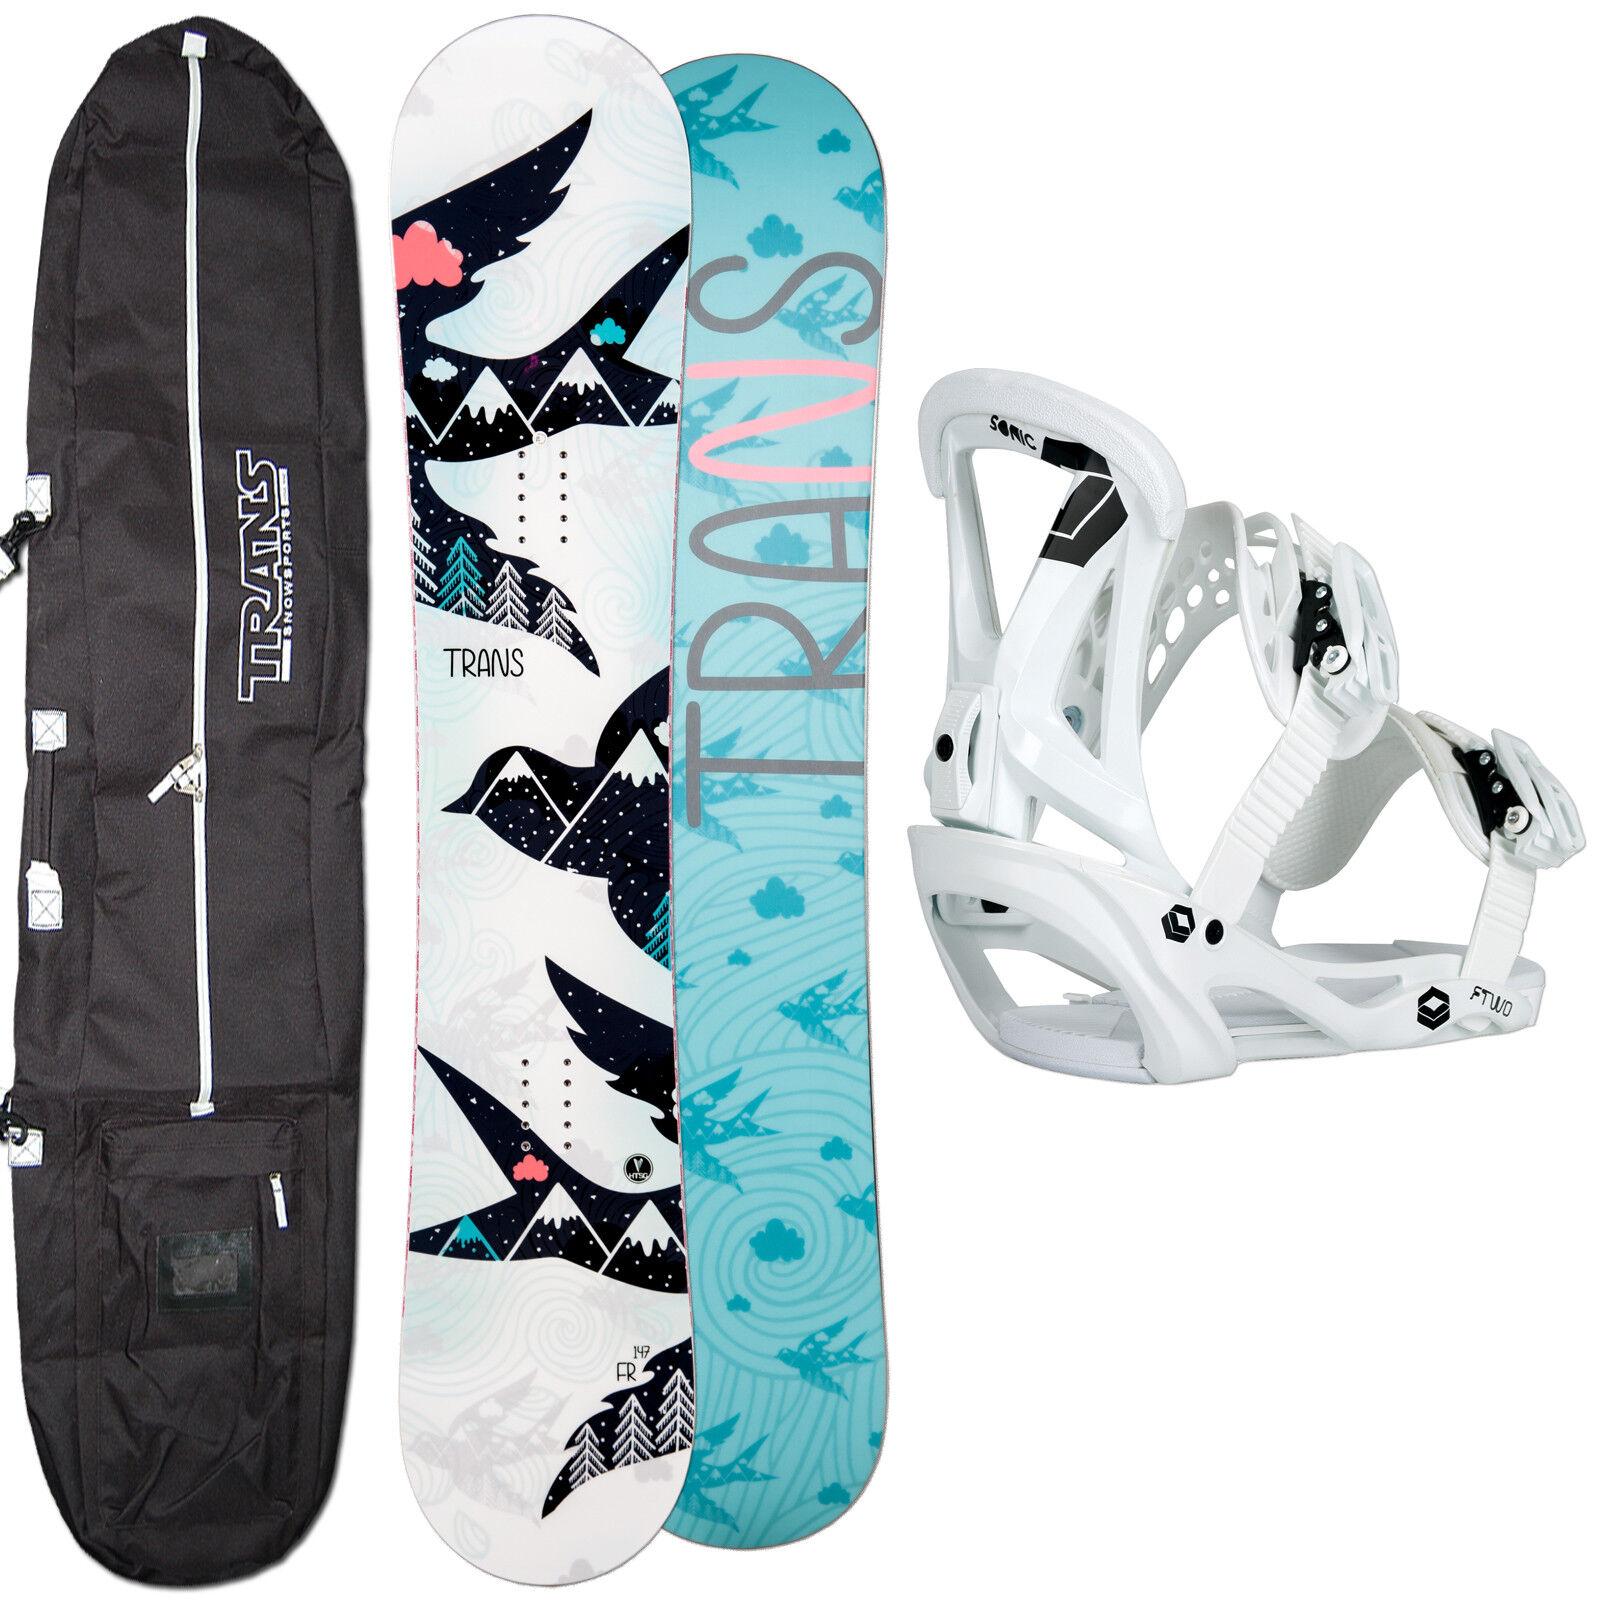 Women's Snowboard Set Trans Fr Girl White 152 cm + Ftwo Sonic Binding SIZE M +